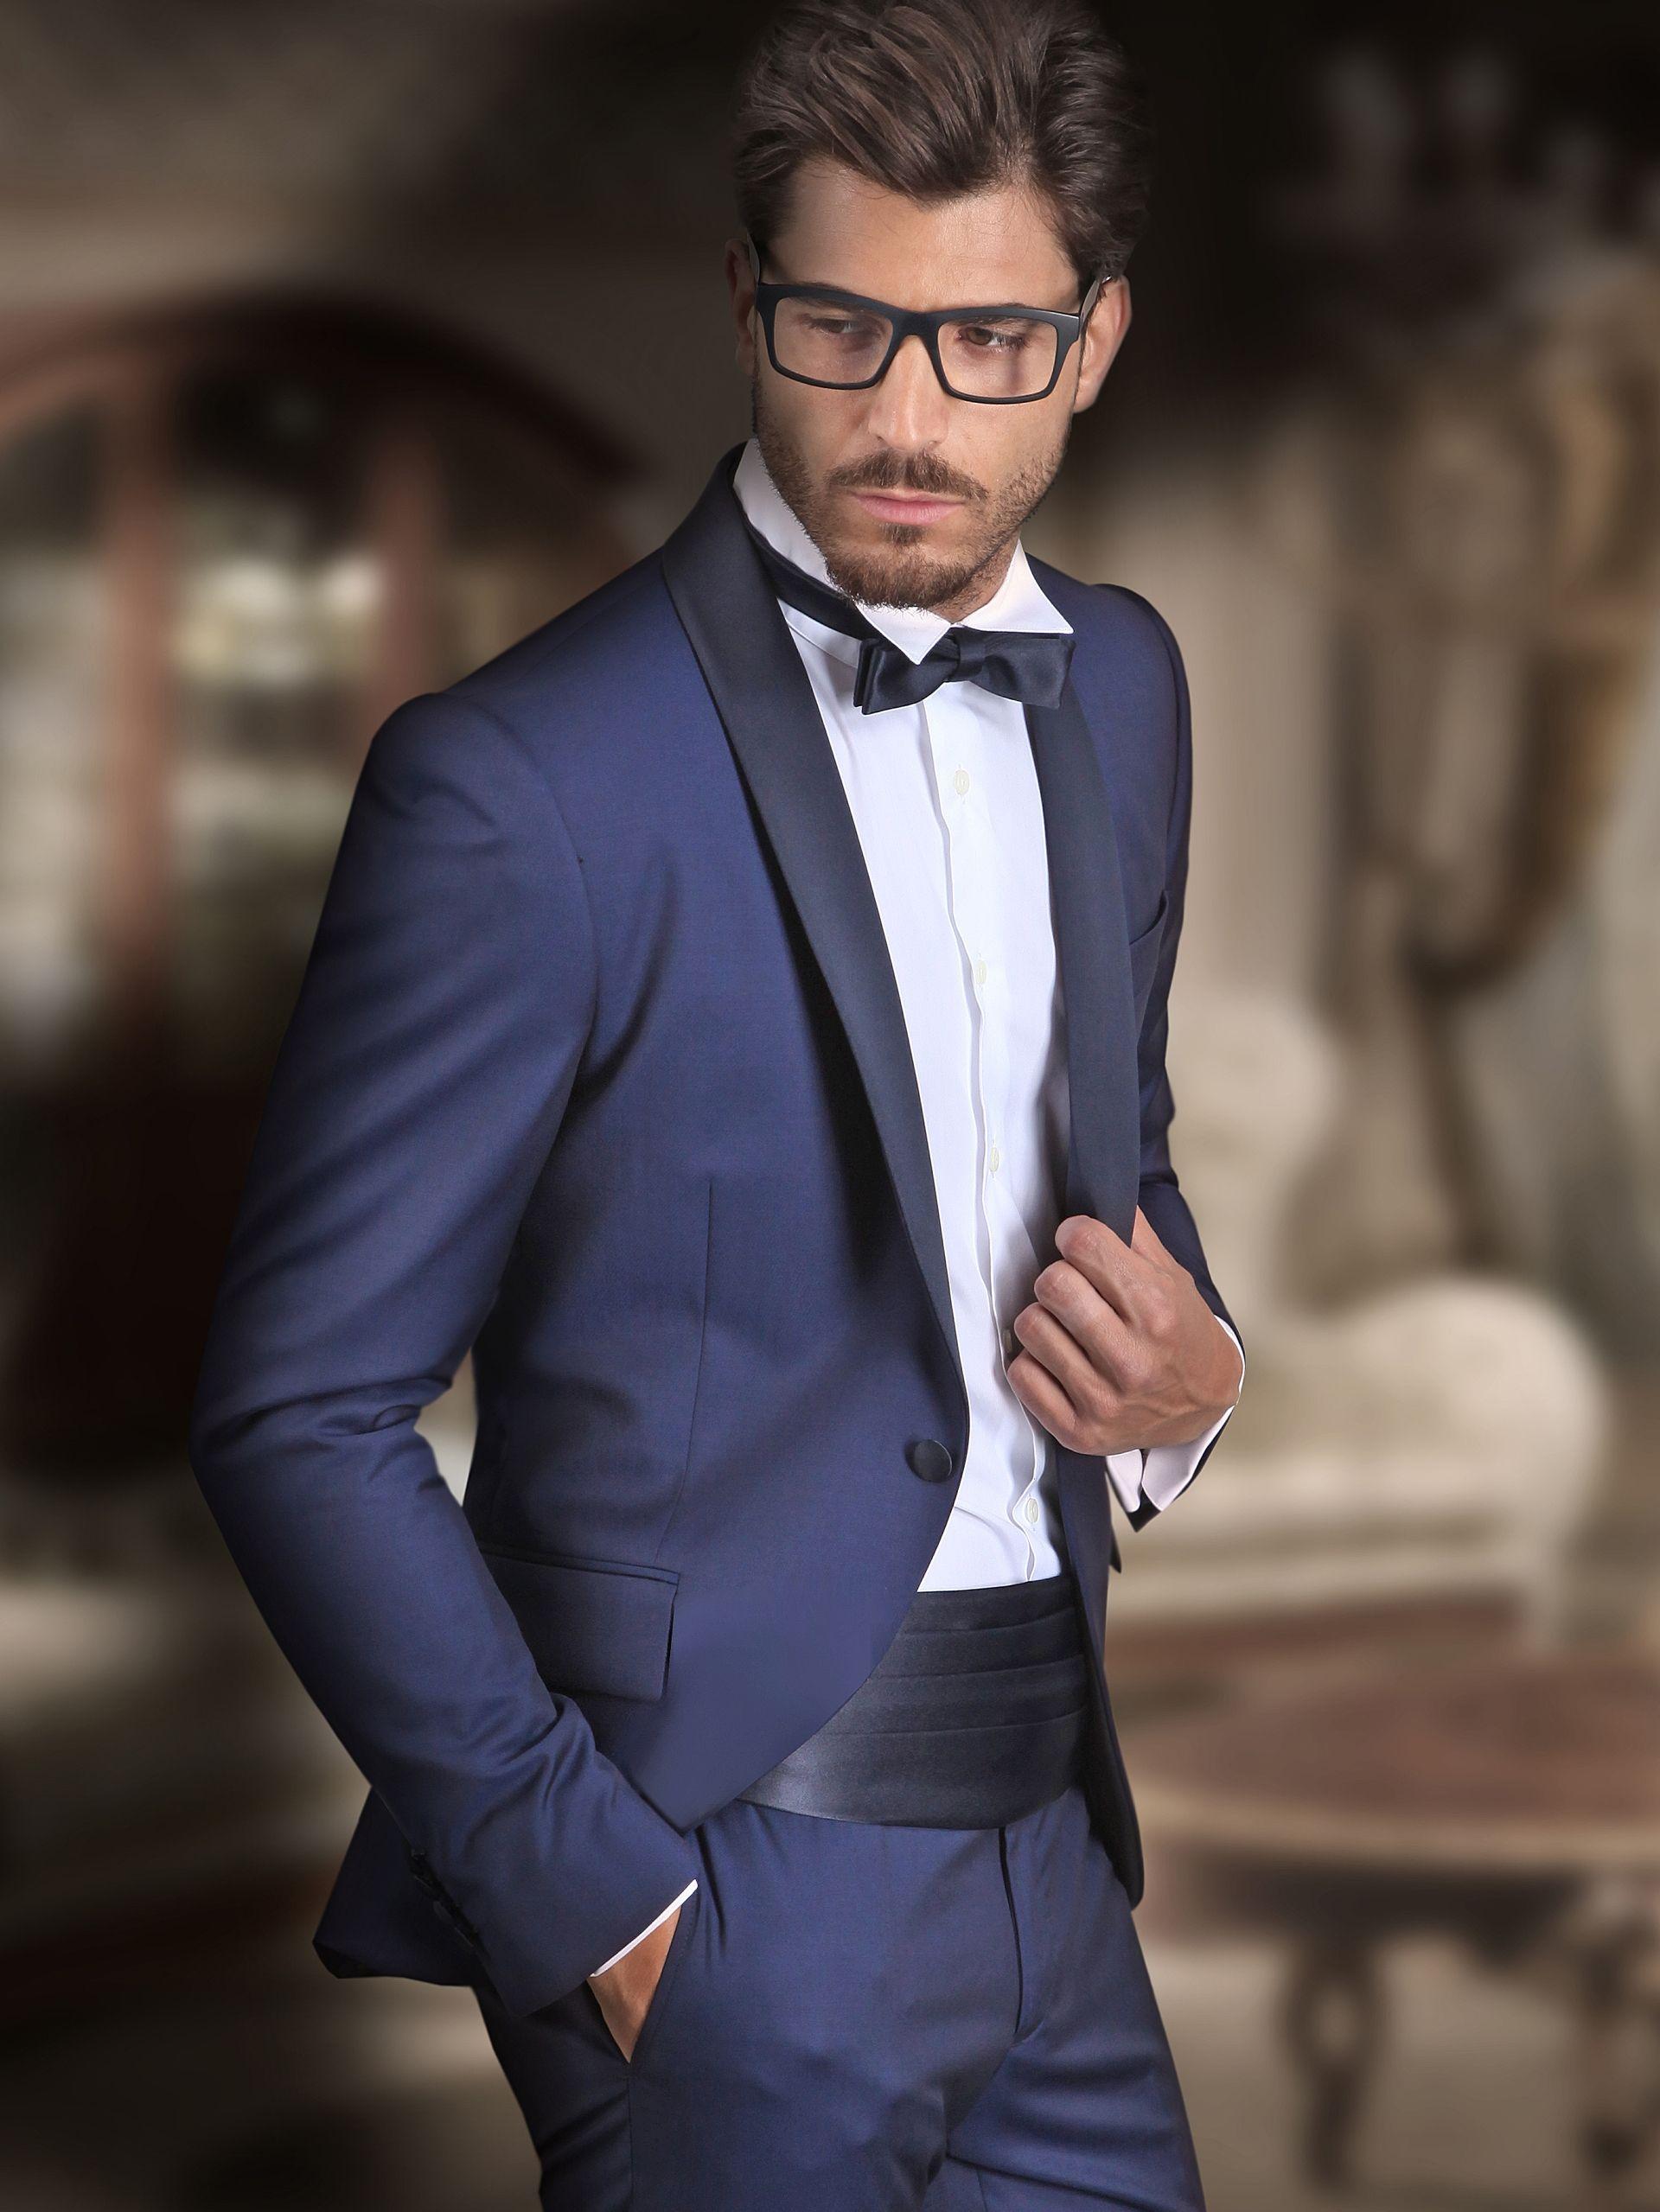 Vestito Matrimonio Uomo Vintage : Abiti da sposo uomo prezzi smok pinterest